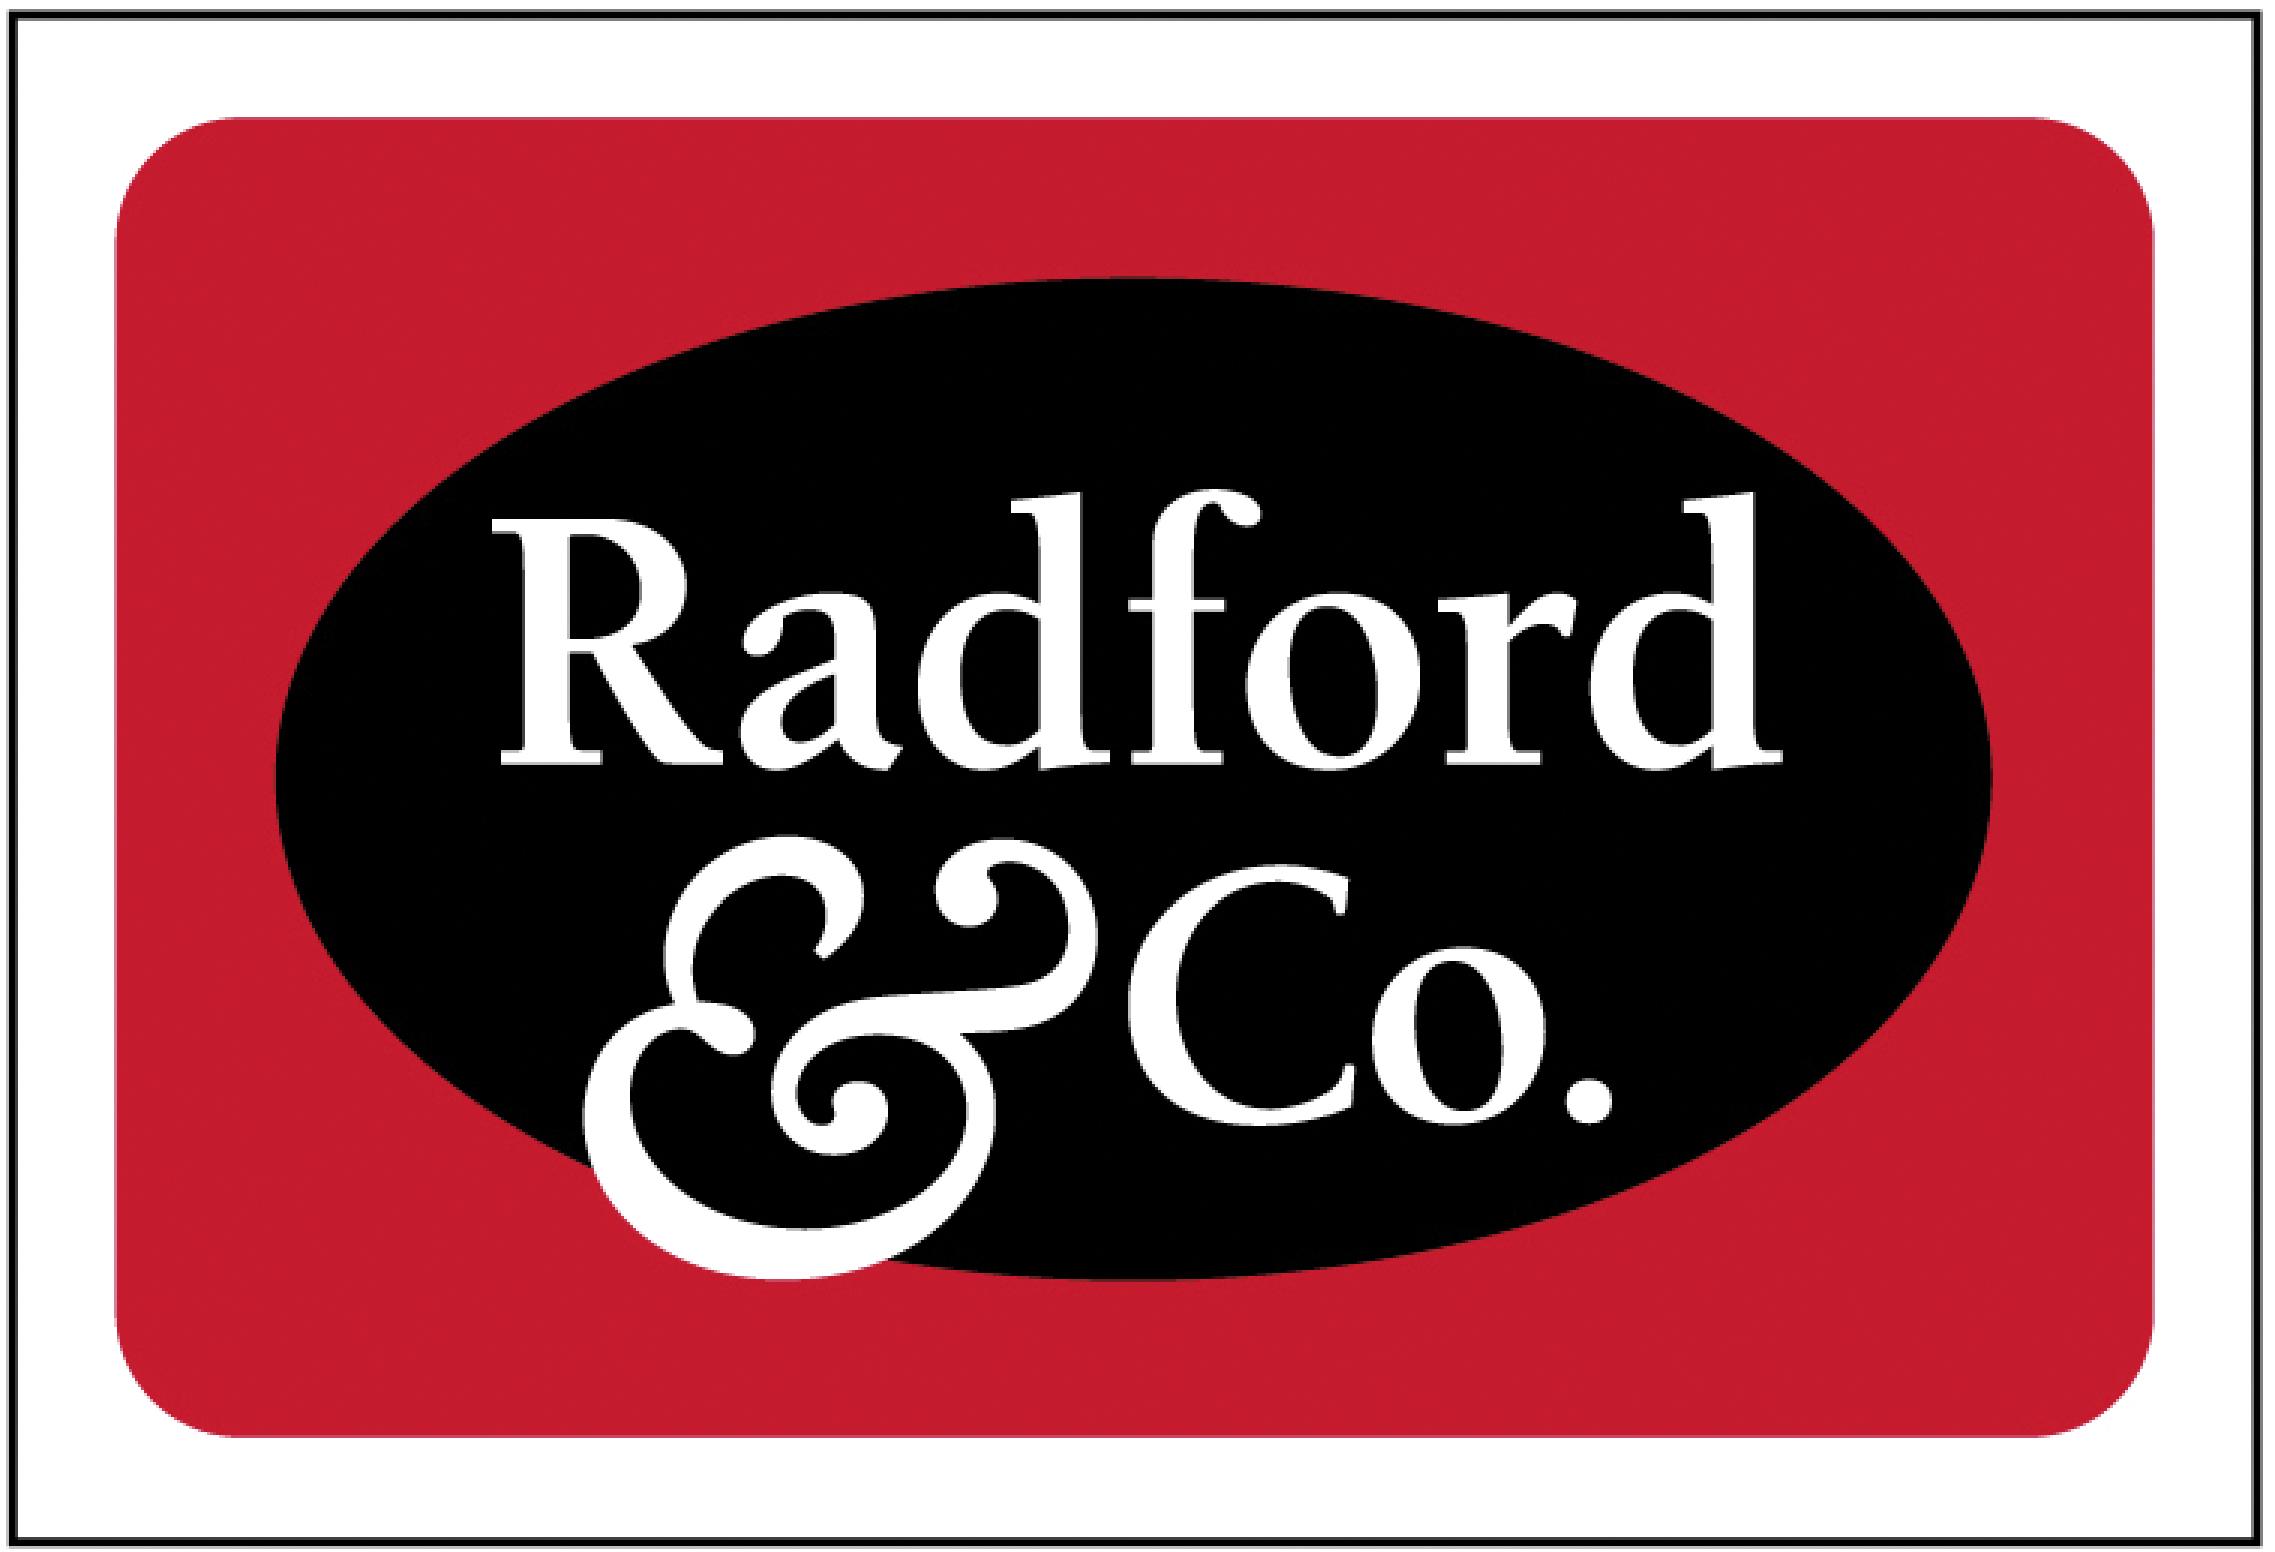 Radford & Co.